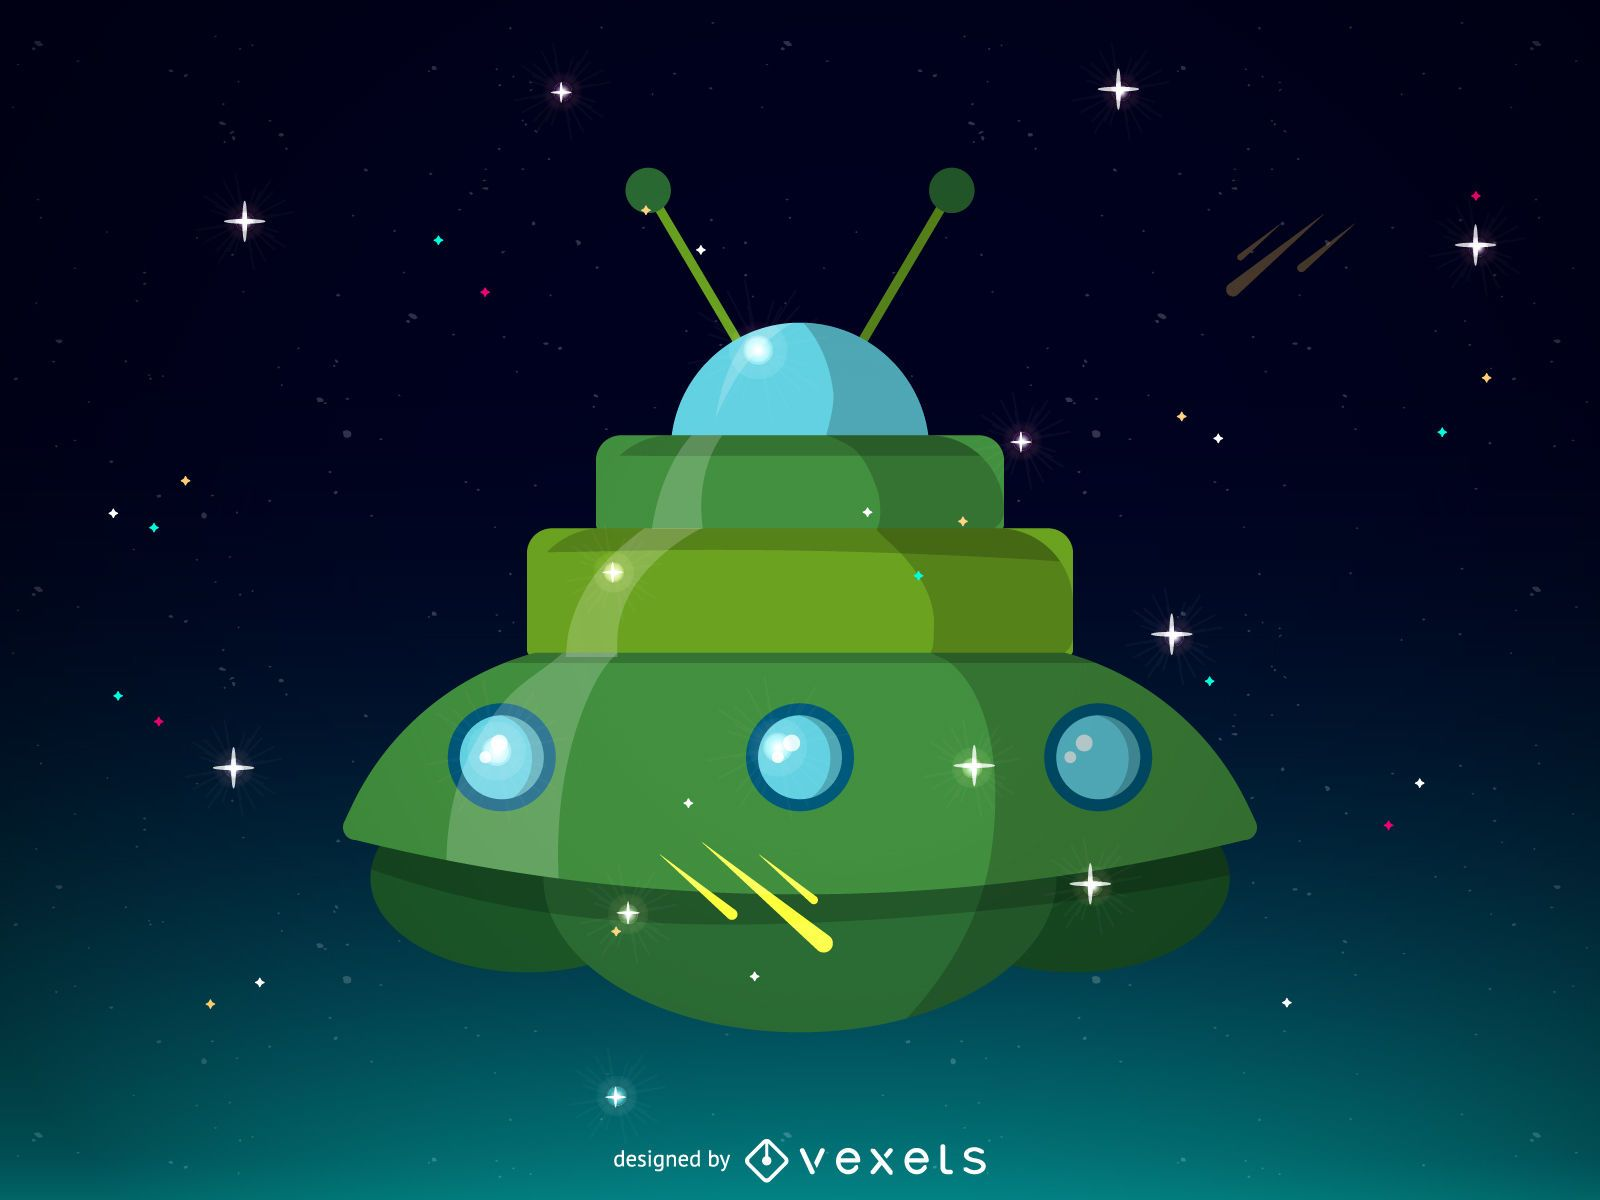 Grünes Raumschiff-Illustrationsdesign